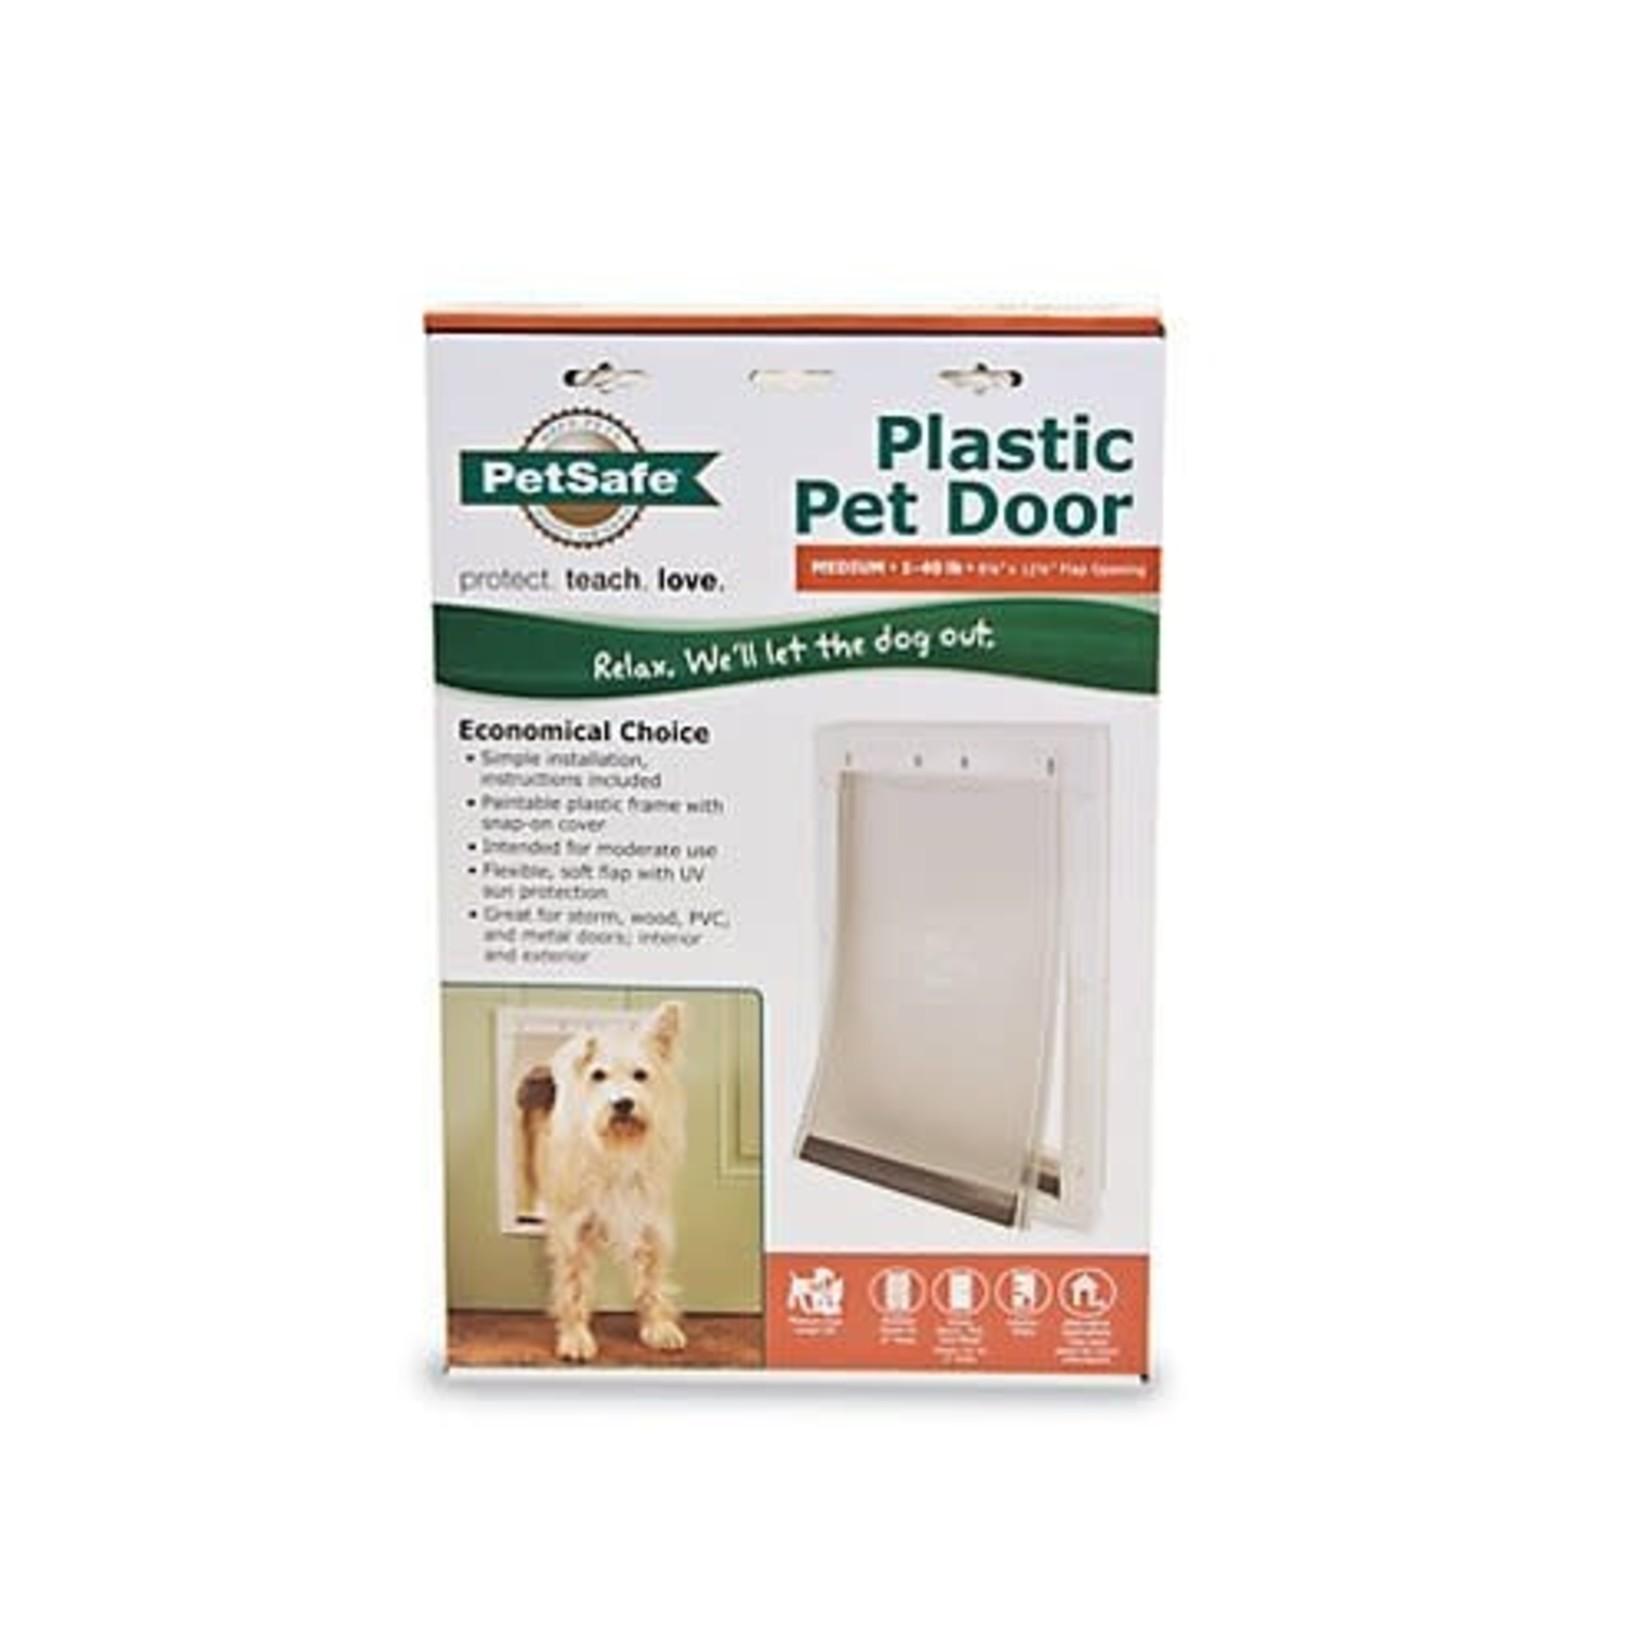 Pet Safe PetSafe Plastic Pet Door Medium